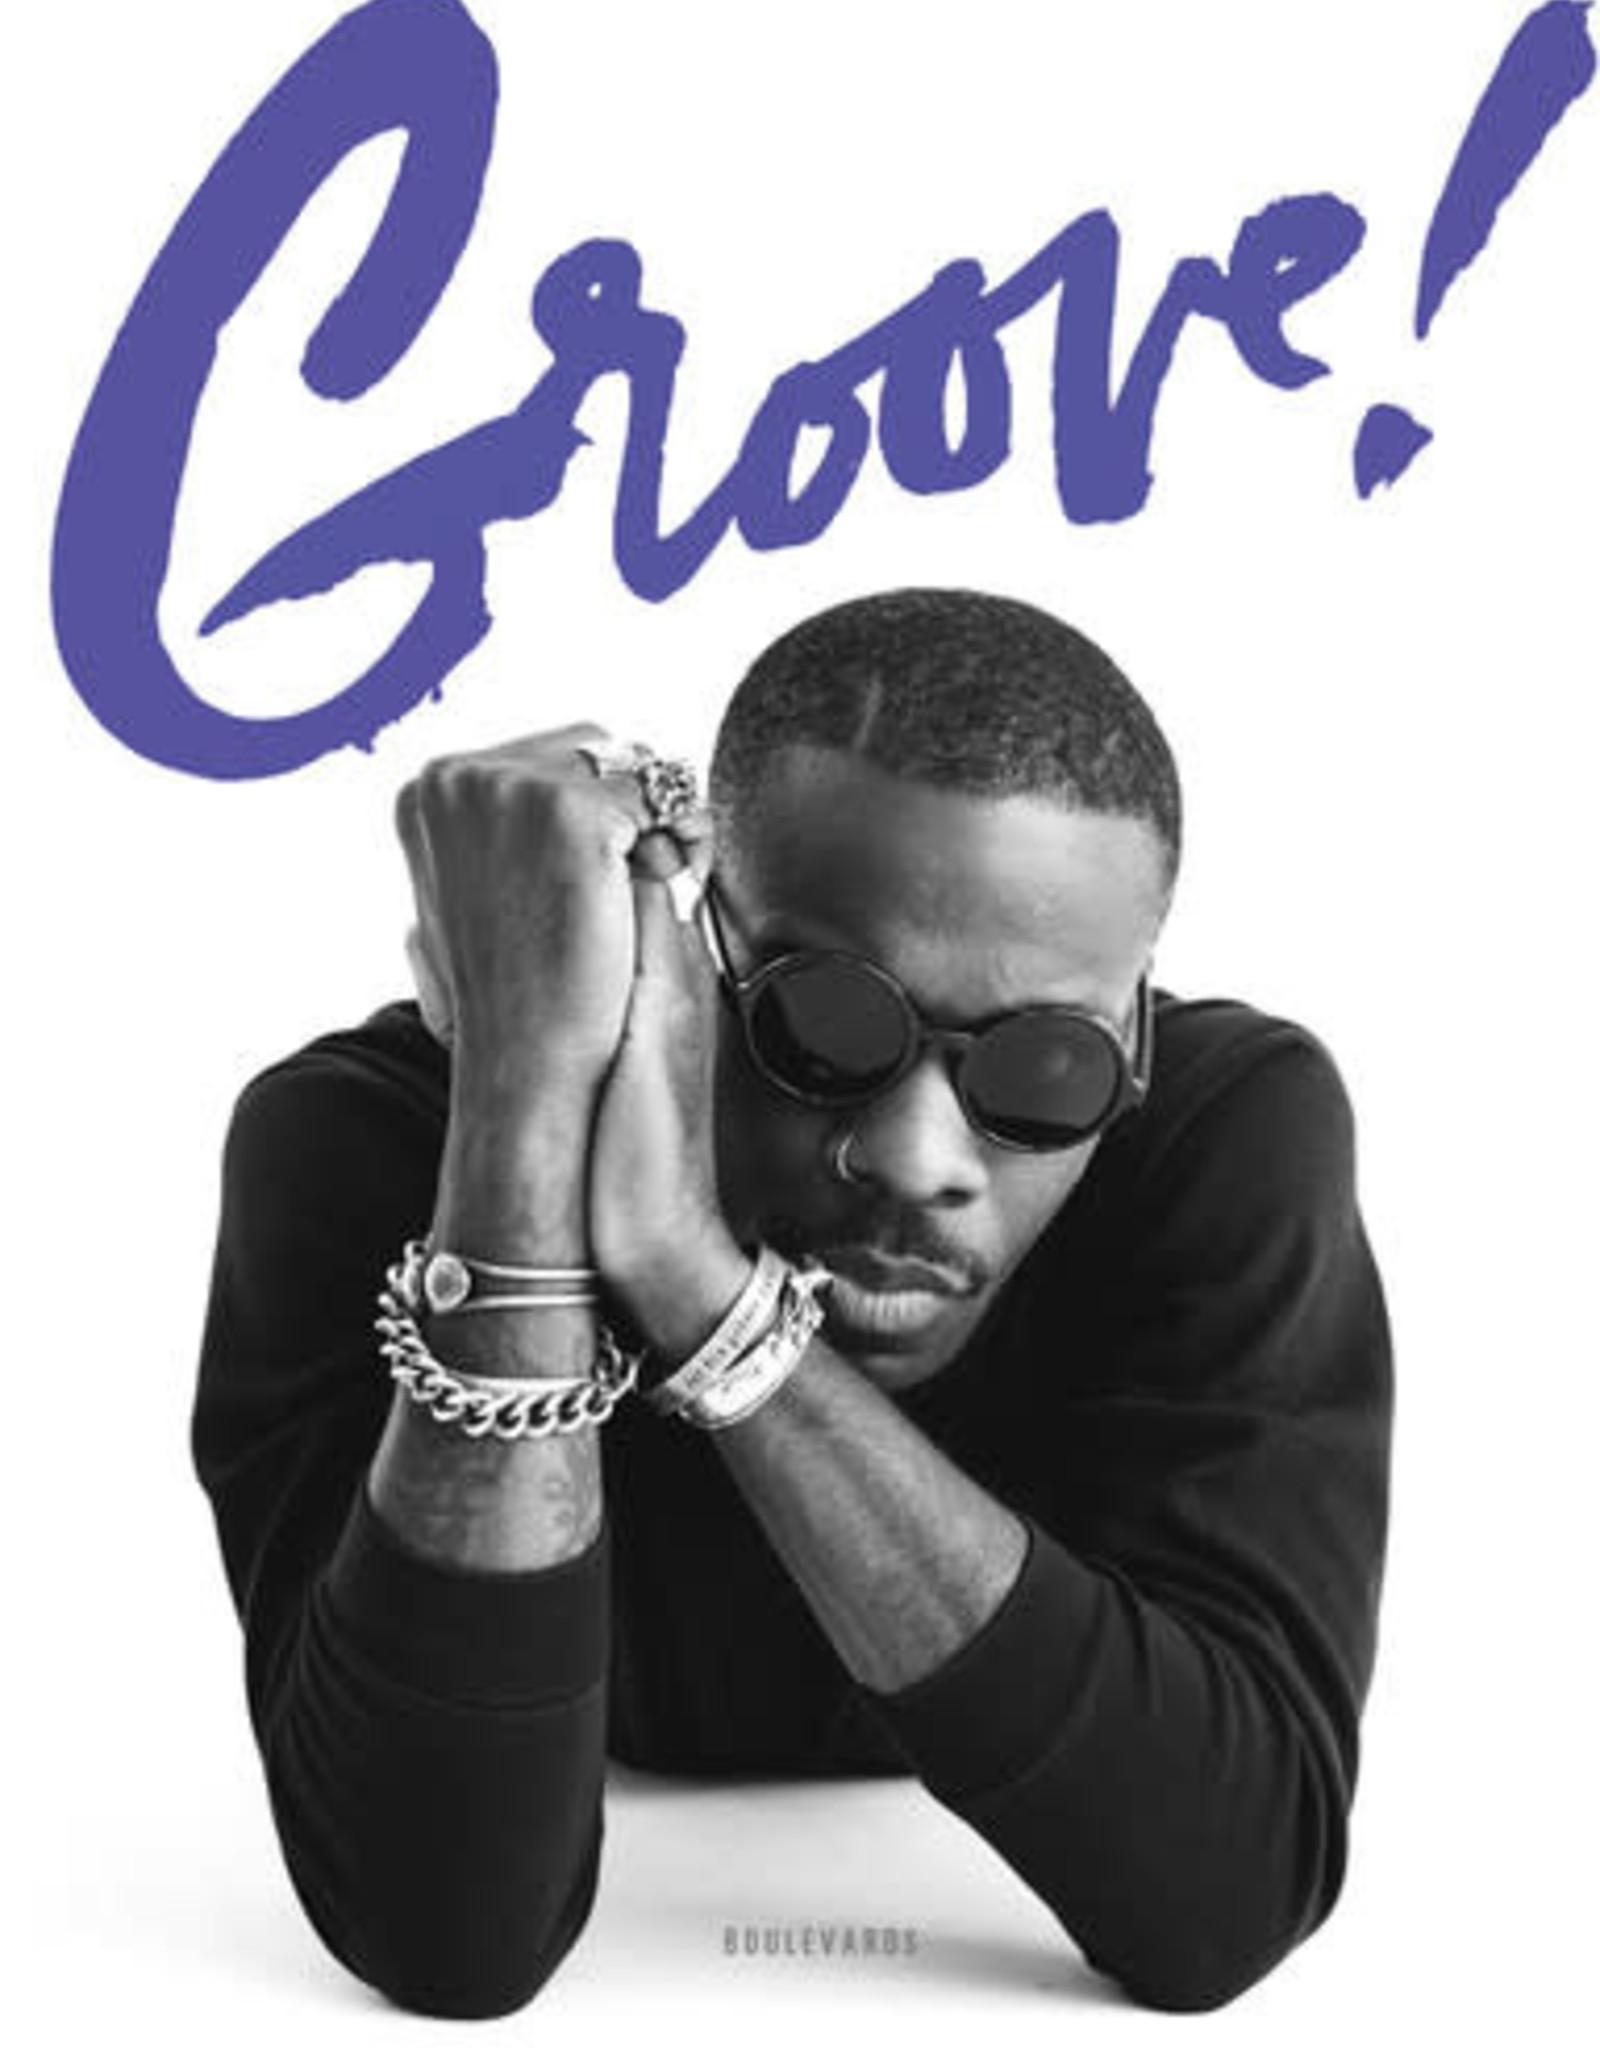 Boulevards - Groove